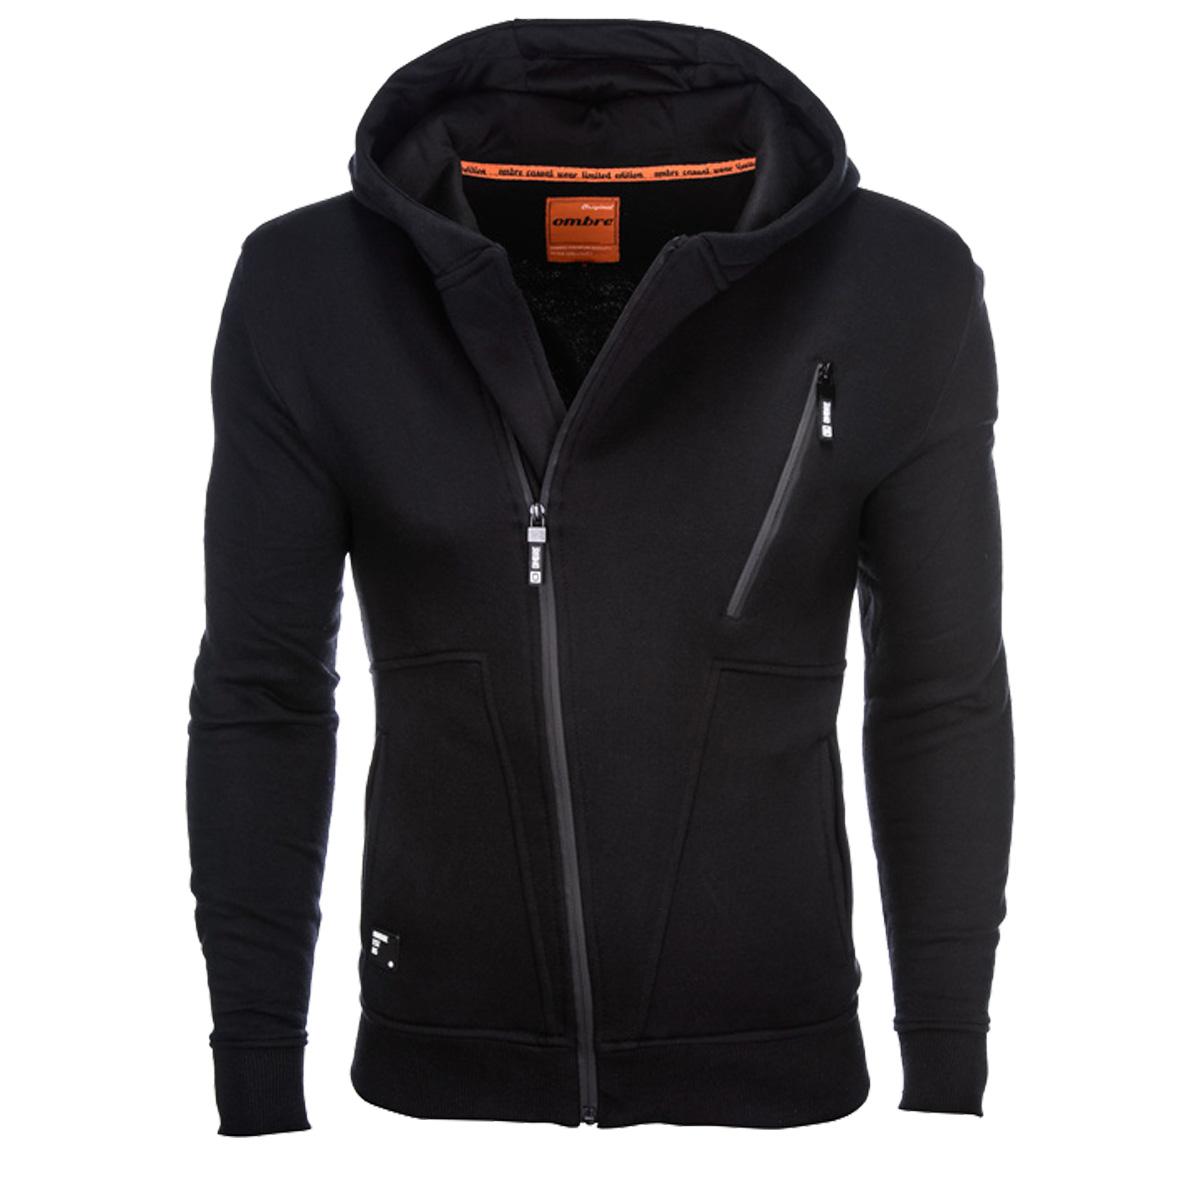 Ombre Clothing Férfi pulóver kapucnival Randy fekete - Glami.hu 60af1fa75e